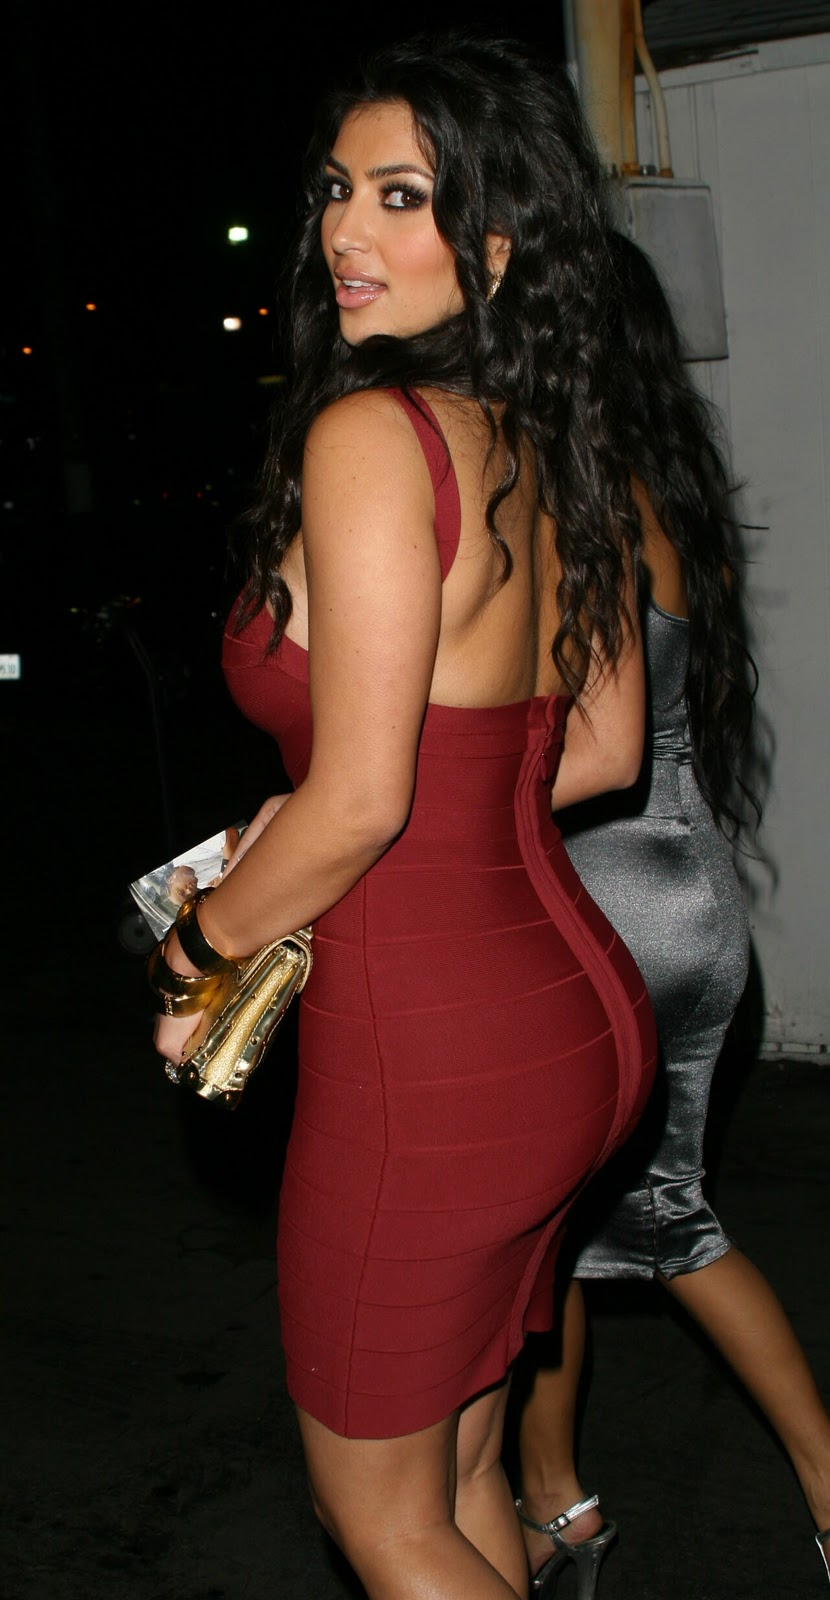 PELÍCULAS ERÓTICAS Kim-kardashian-butt-red-dress